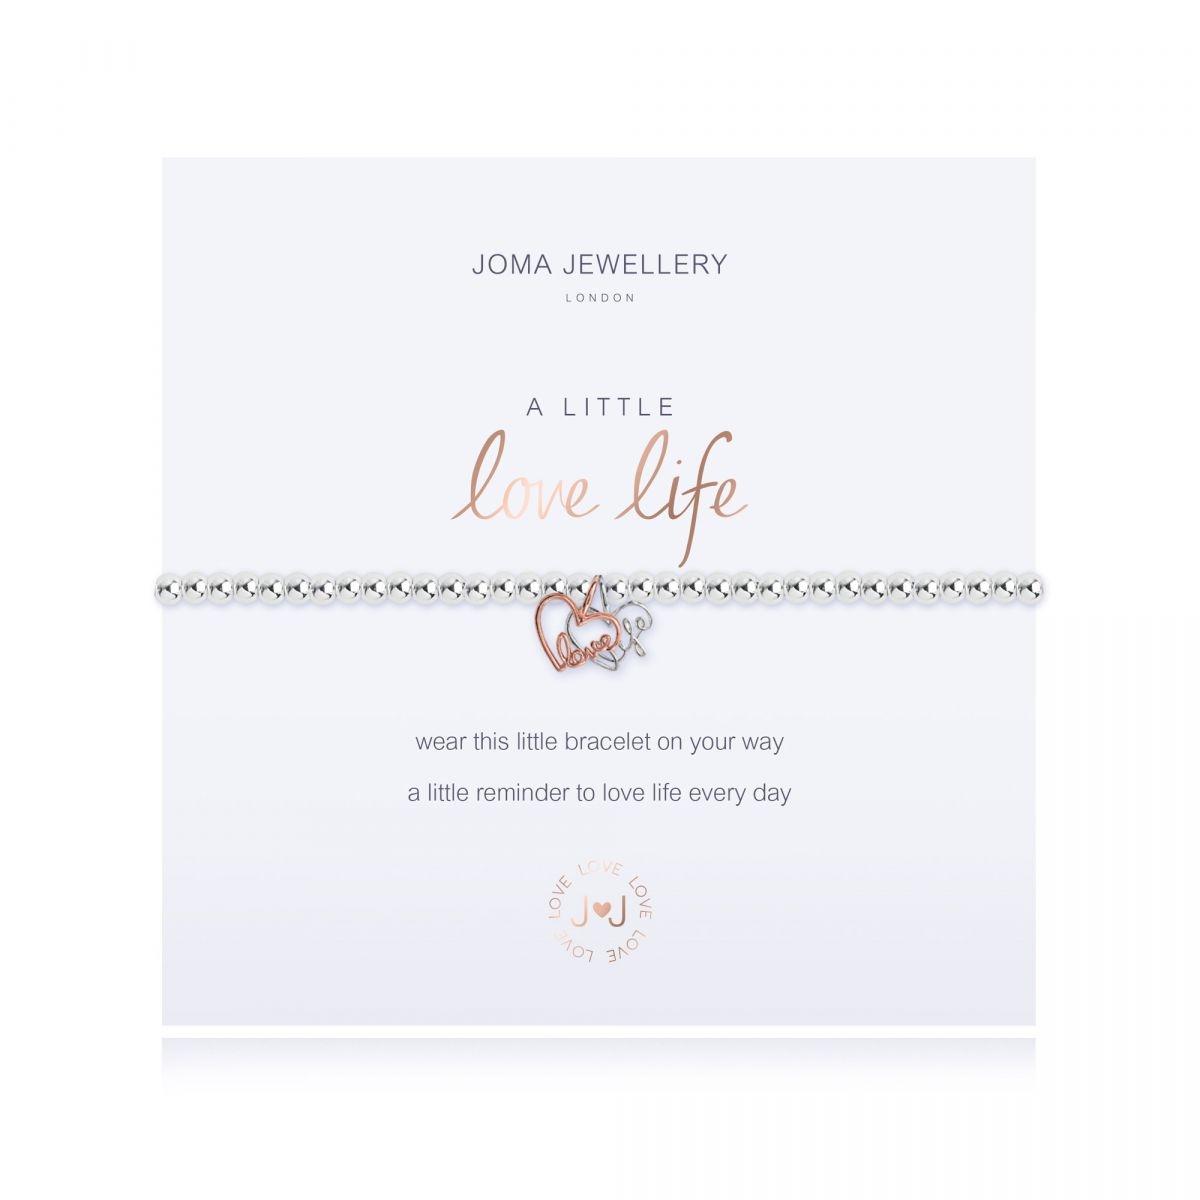 Joma Jewellery A Little 'Love Life' Bracelet